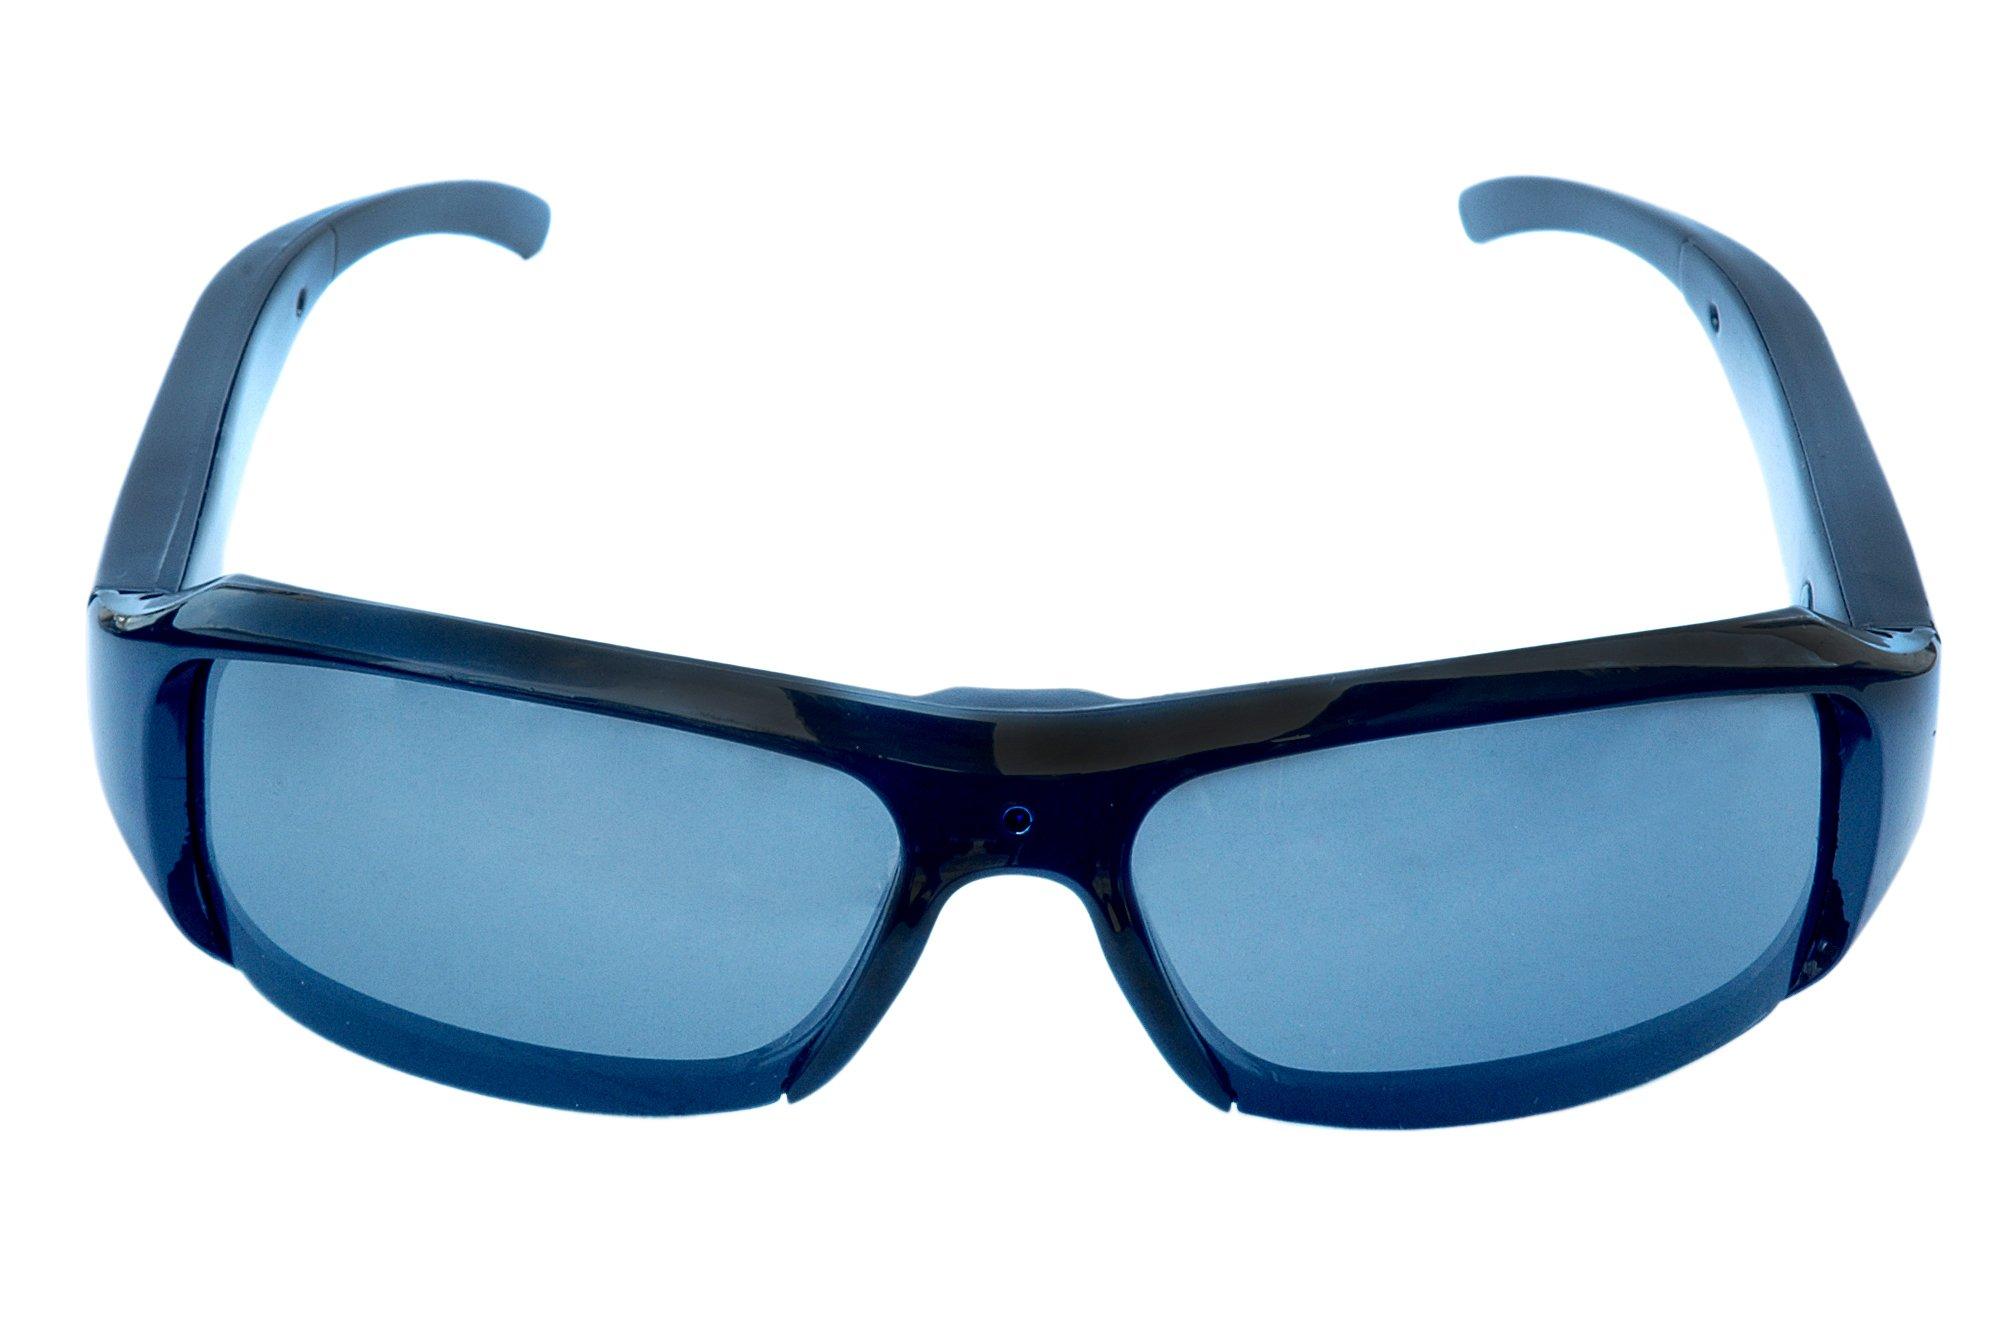 Glasses Camera 1080P HD Small Camera Digital Video Recording,Camakt Camera DVR Camcorder for Men and Women